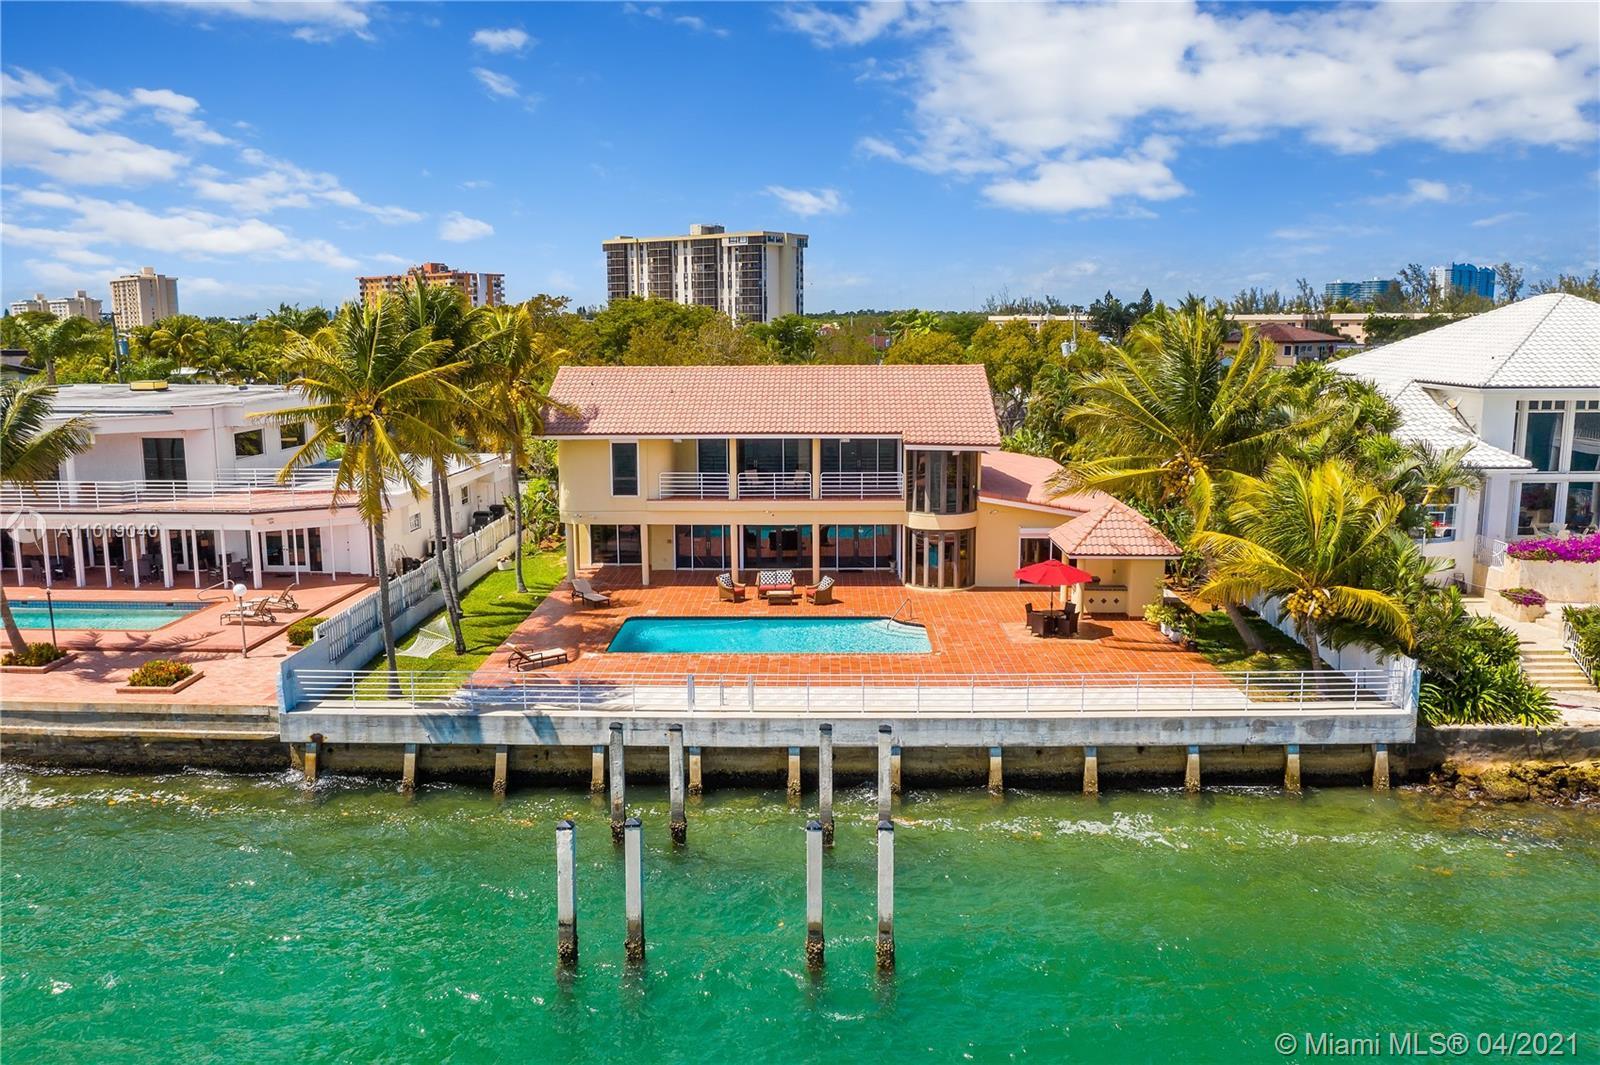 13155 Biscayne Bay Dr Property Photo 1